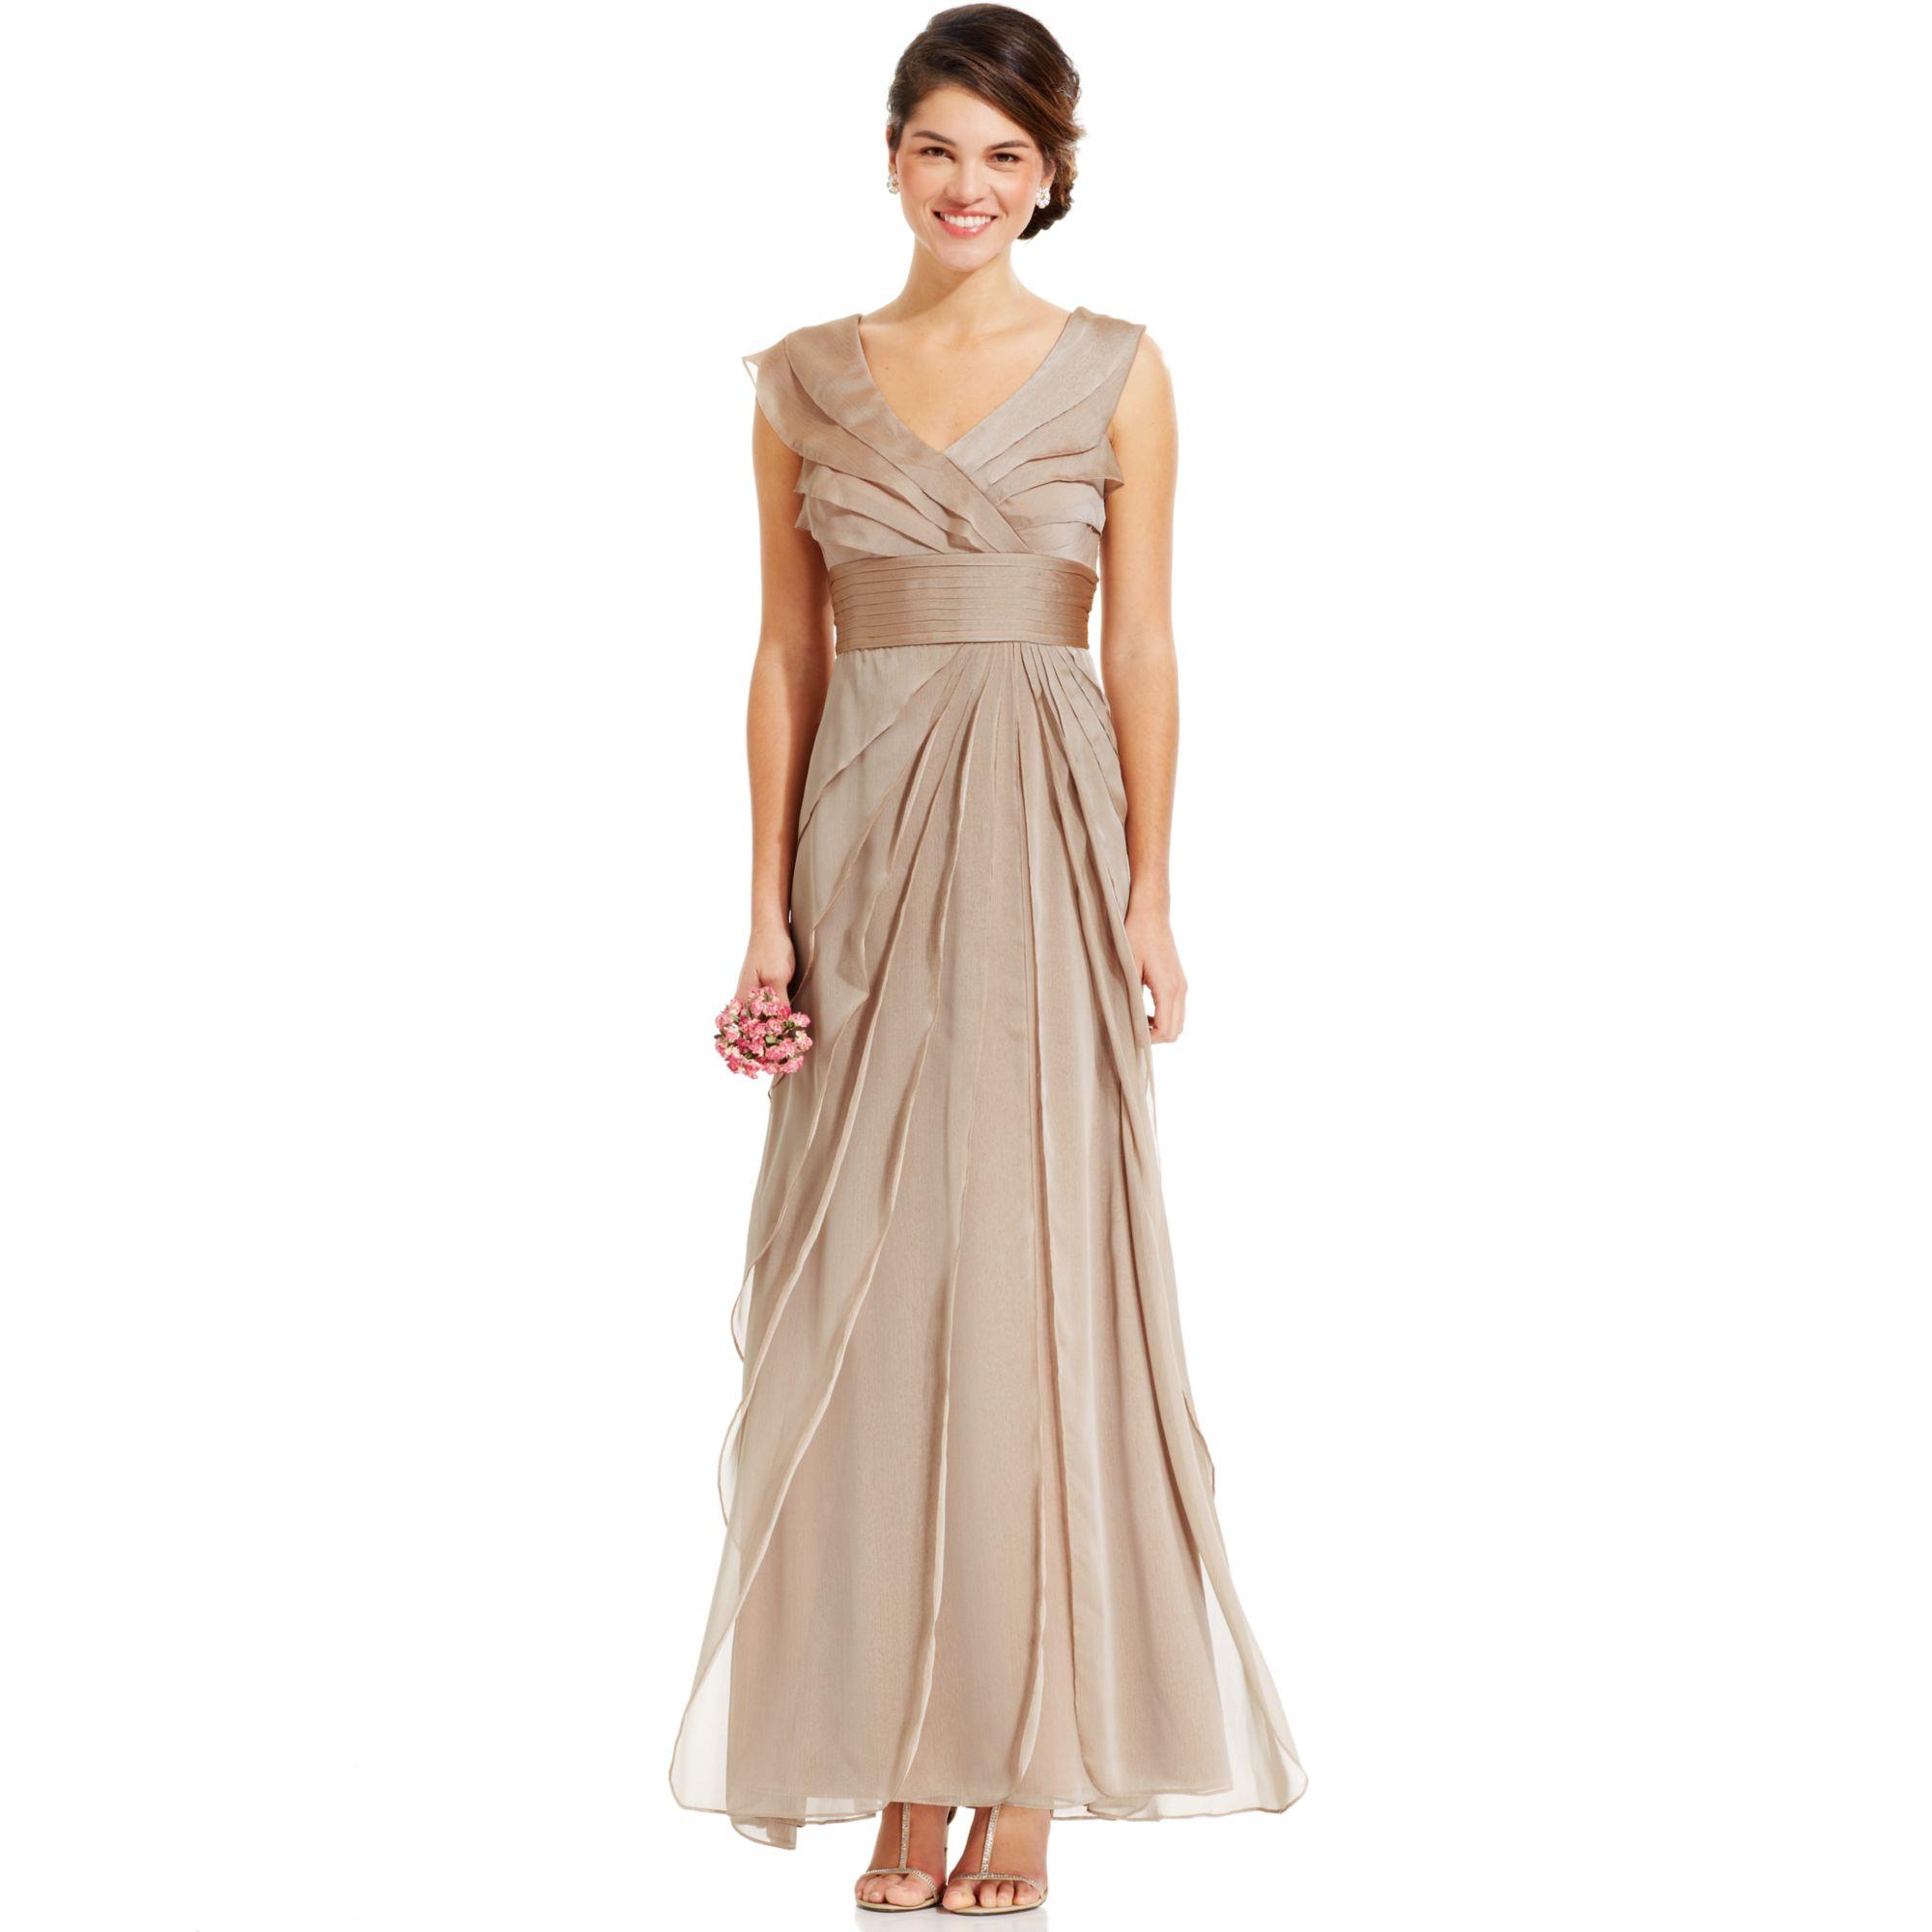 adrianna papell evening dresses photo - 1